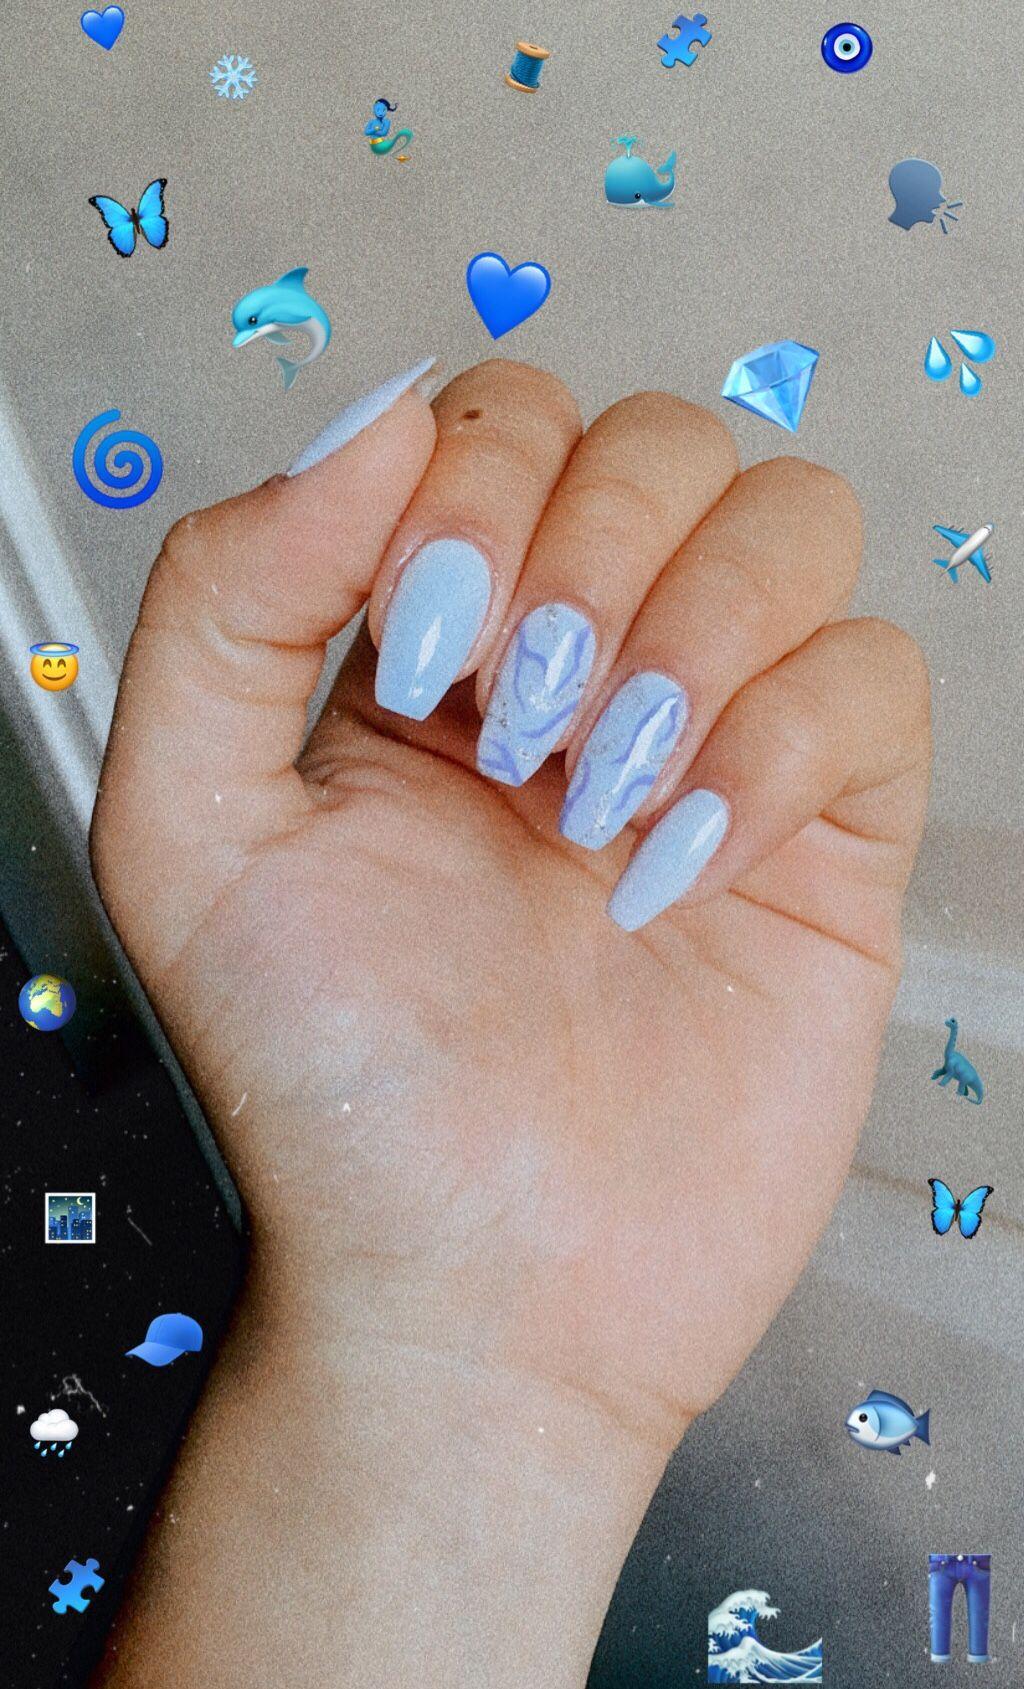 Pin By Lila Sagbigsal On Nails In 2020 Glamour Nails Nails Pastel Blue Nails